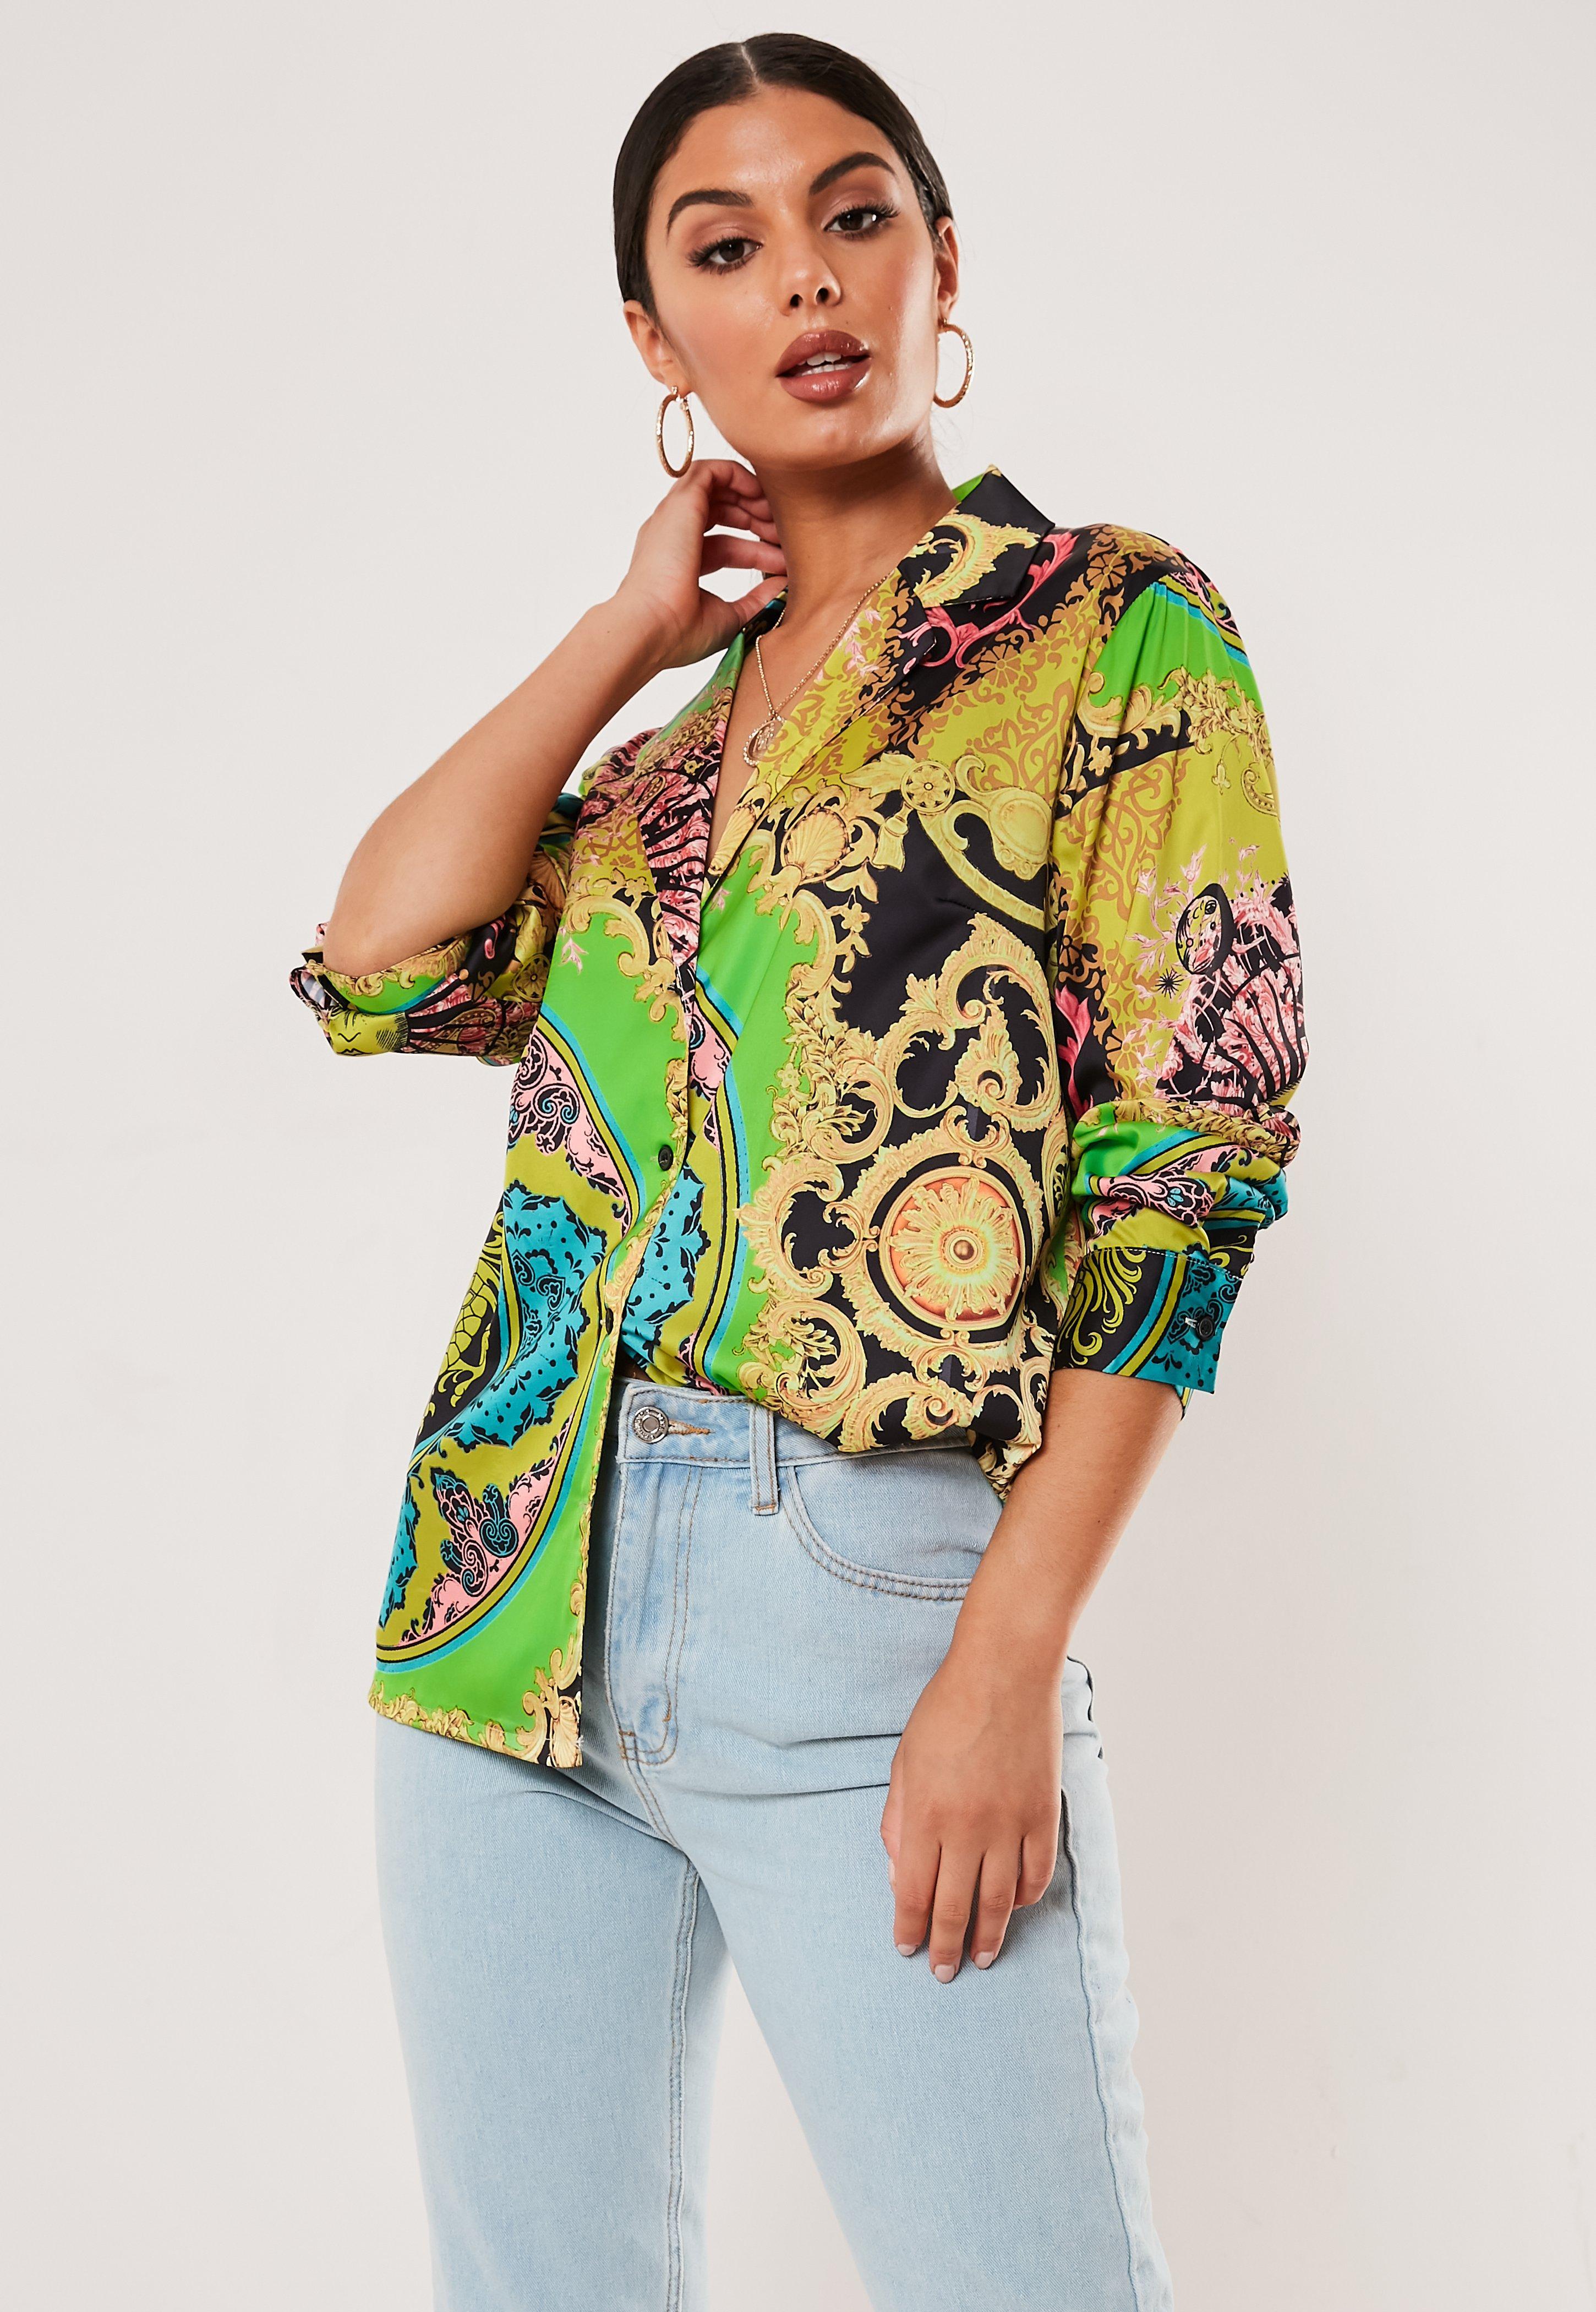 73a2d1e1acd156 Blouses | Women's Floral, Chiffon & Satin Blouses - Missguided